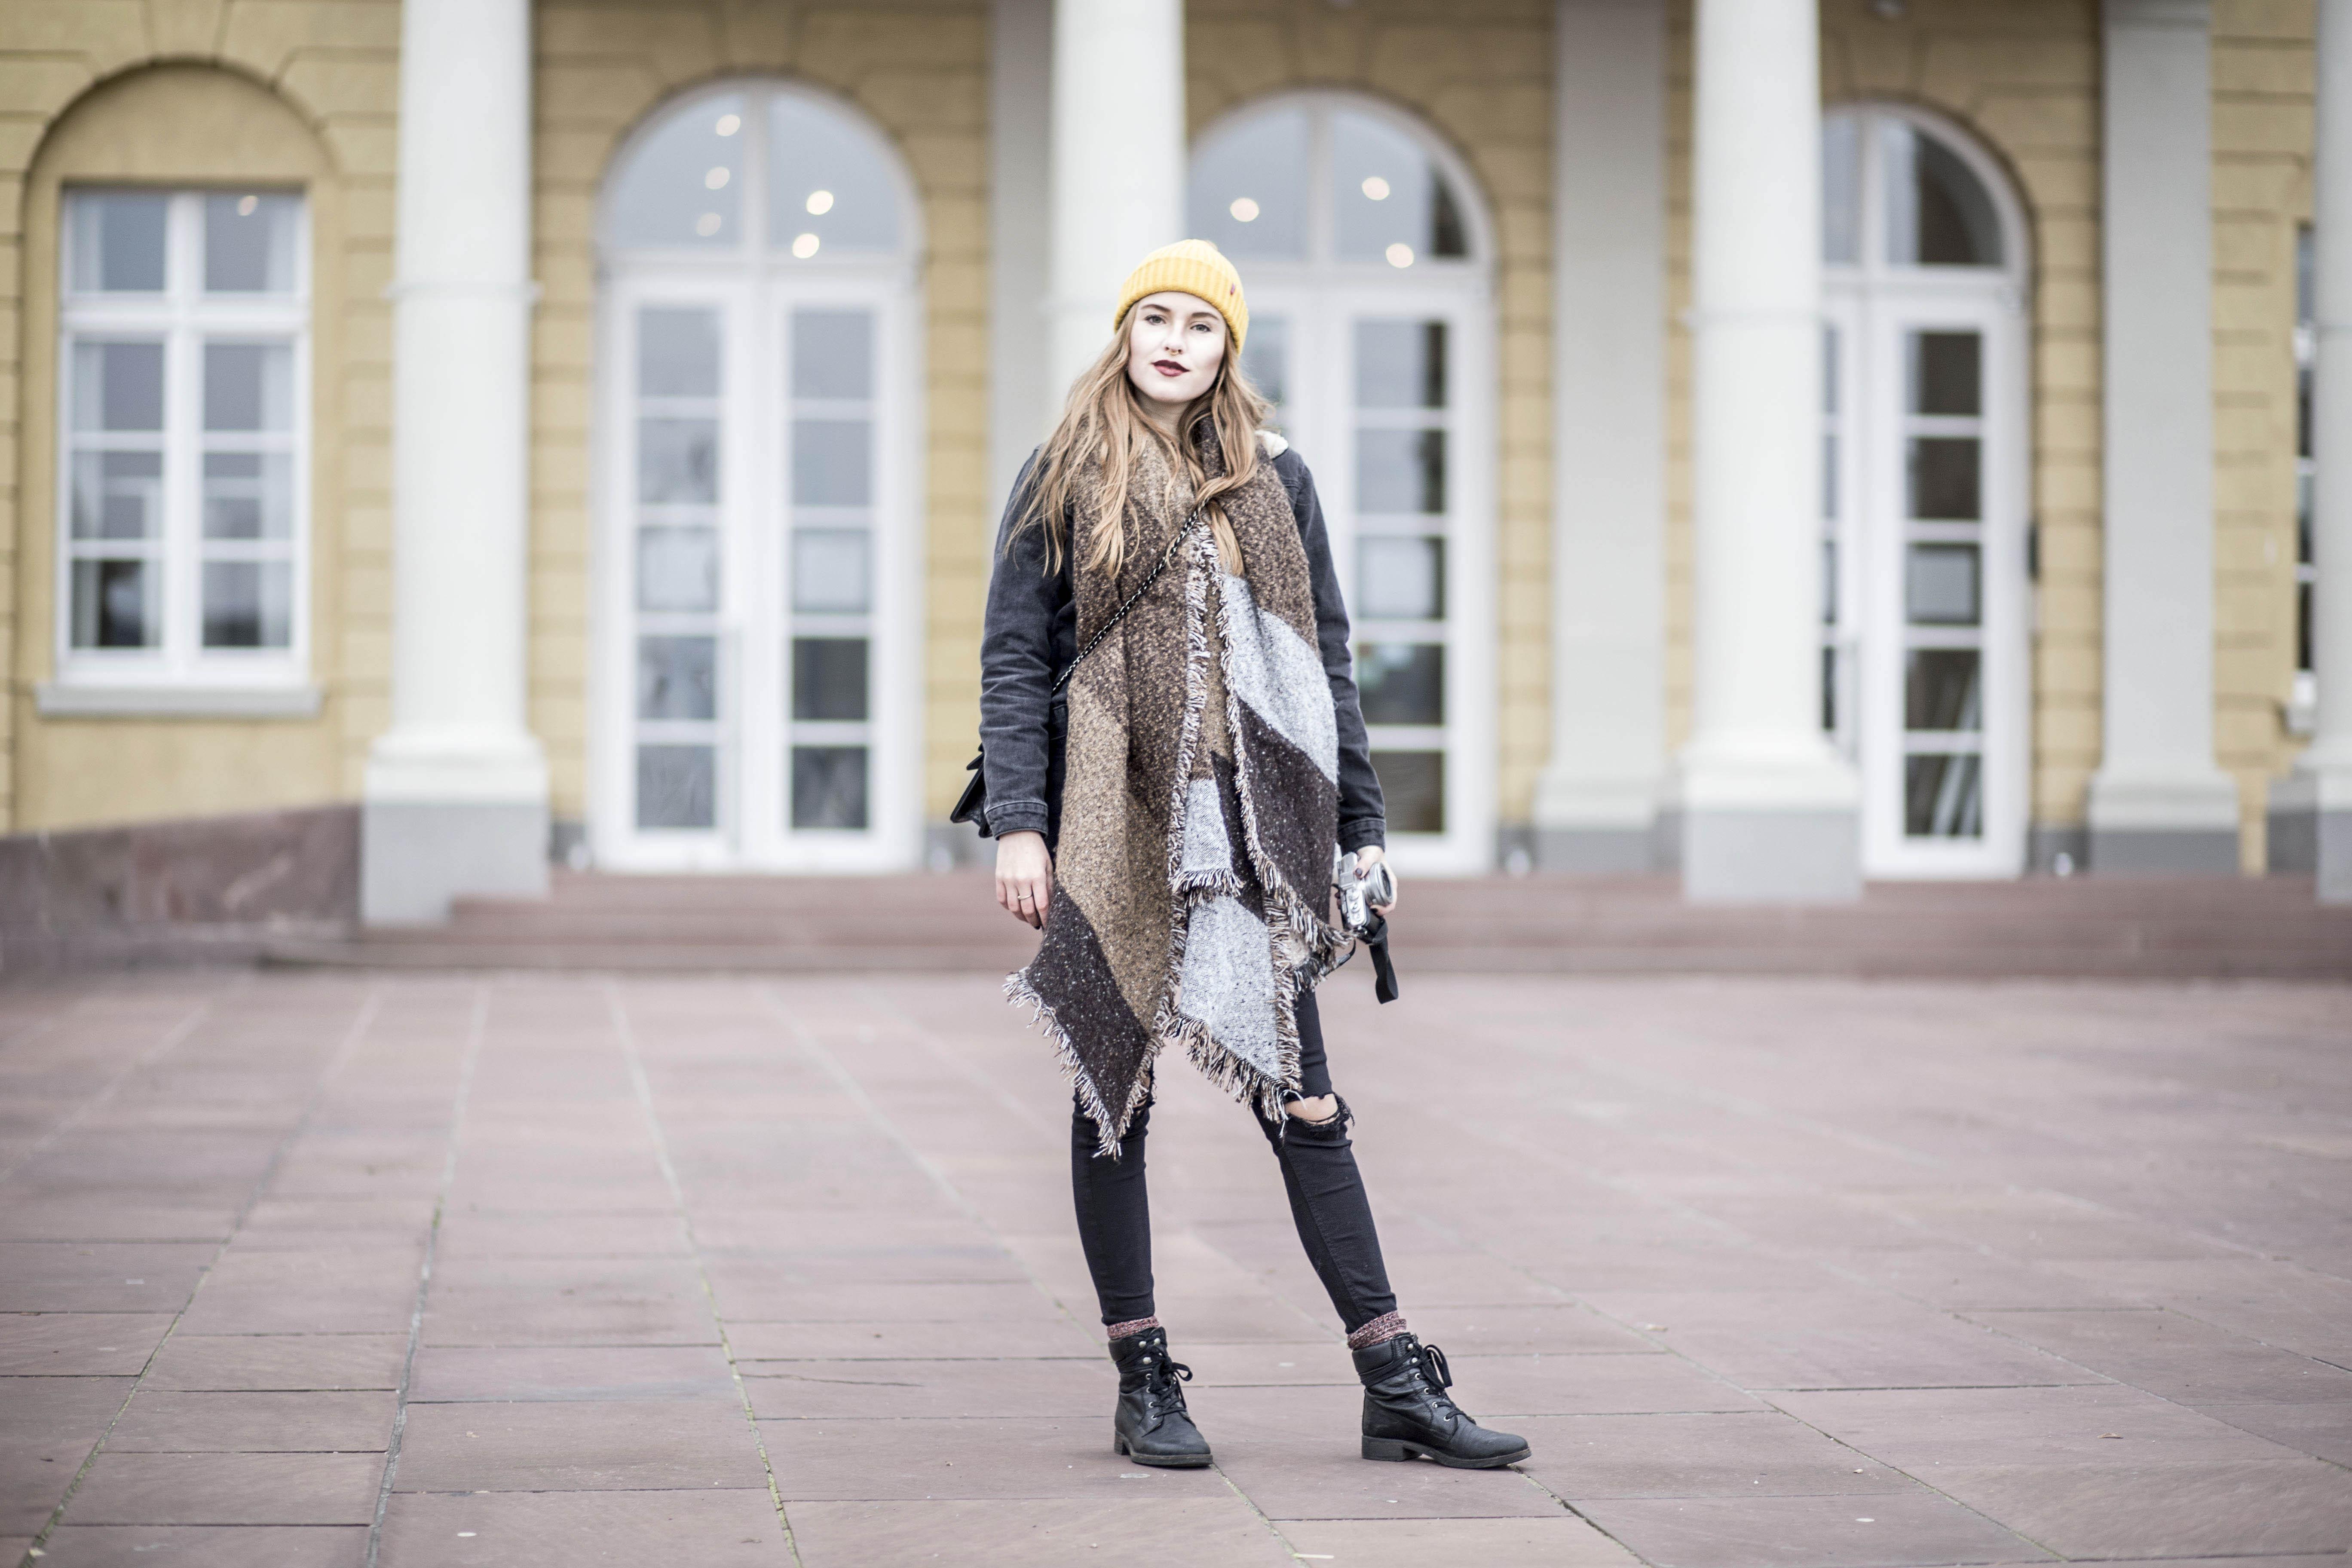 sassy-classy-scarf_14